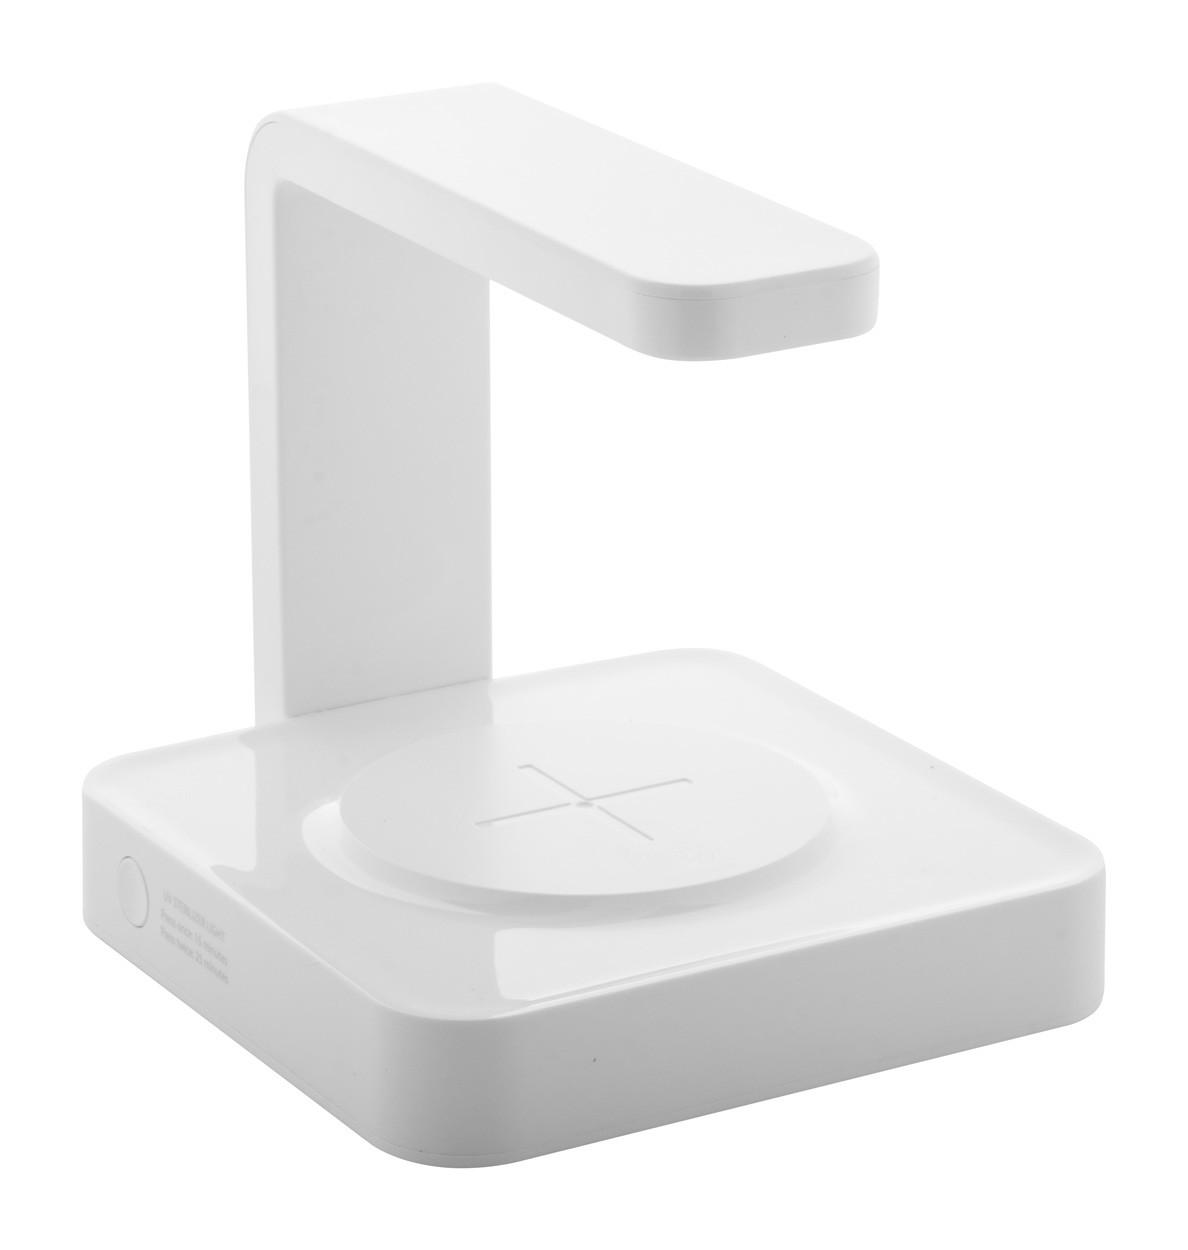 Uv Sterilizer Wireless Charger Blay - White